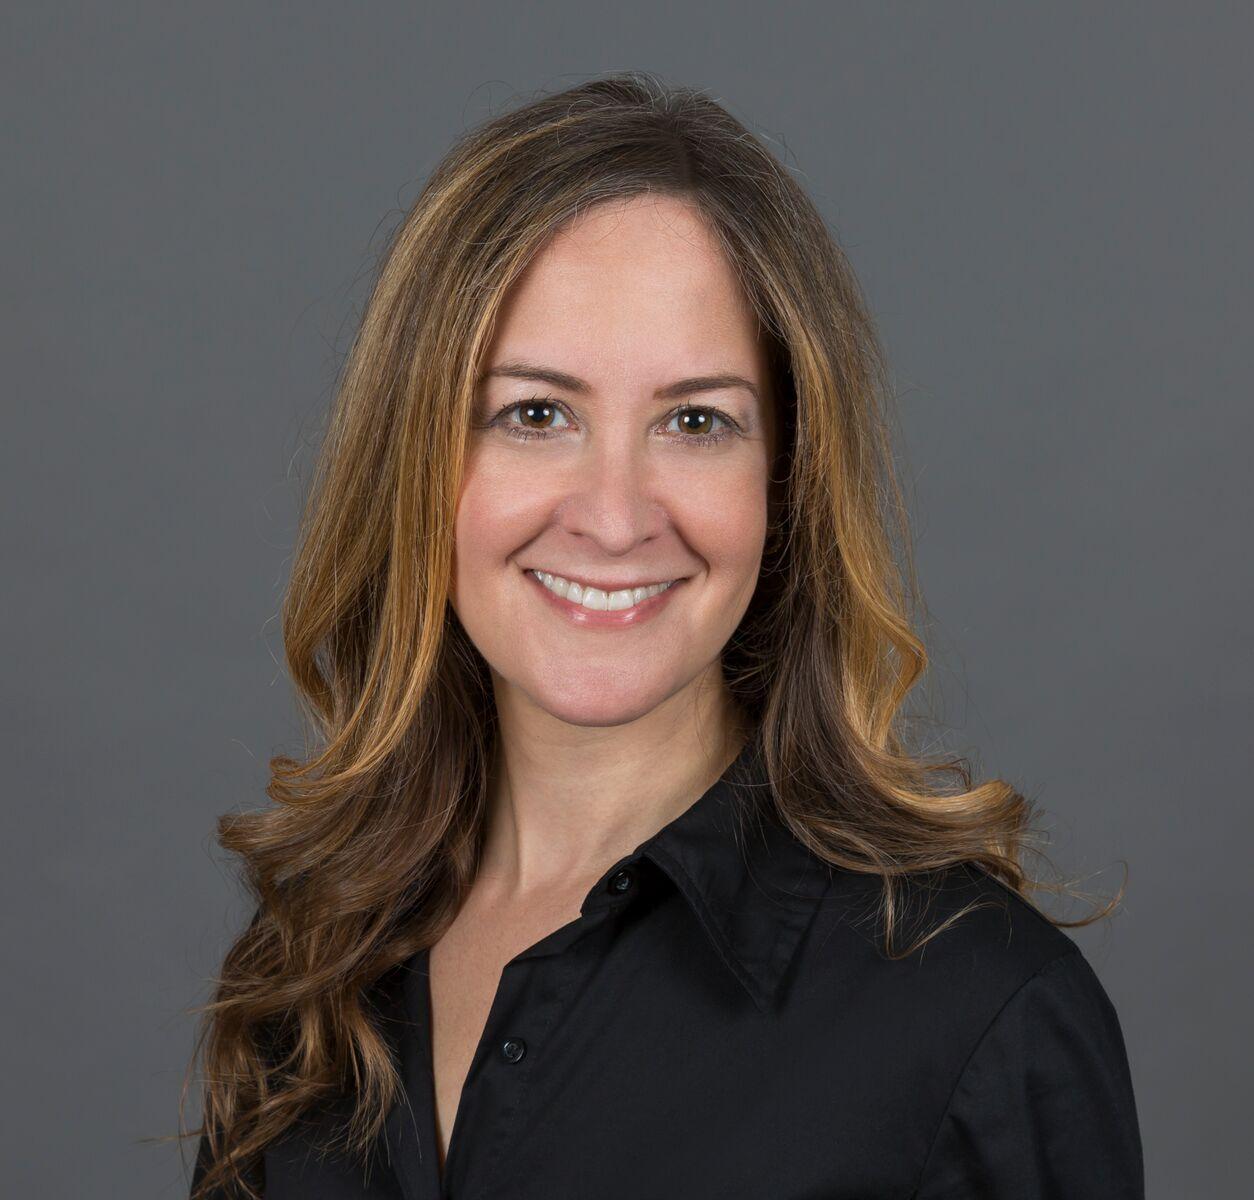 Elisa Birnbaum, Author and Entrepreneur on the power of storytelling